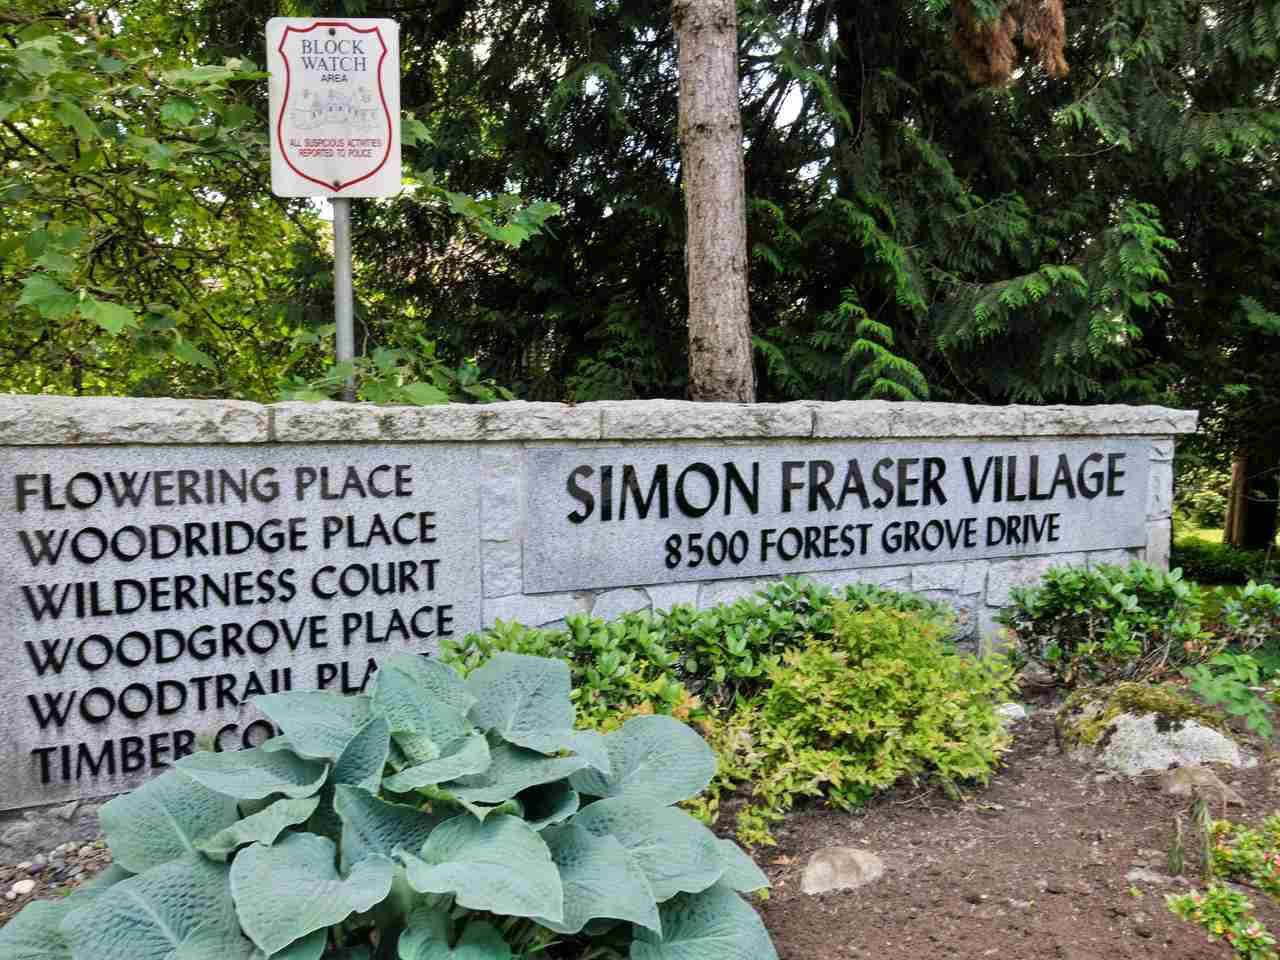 Welcome to Simon Fraser Village